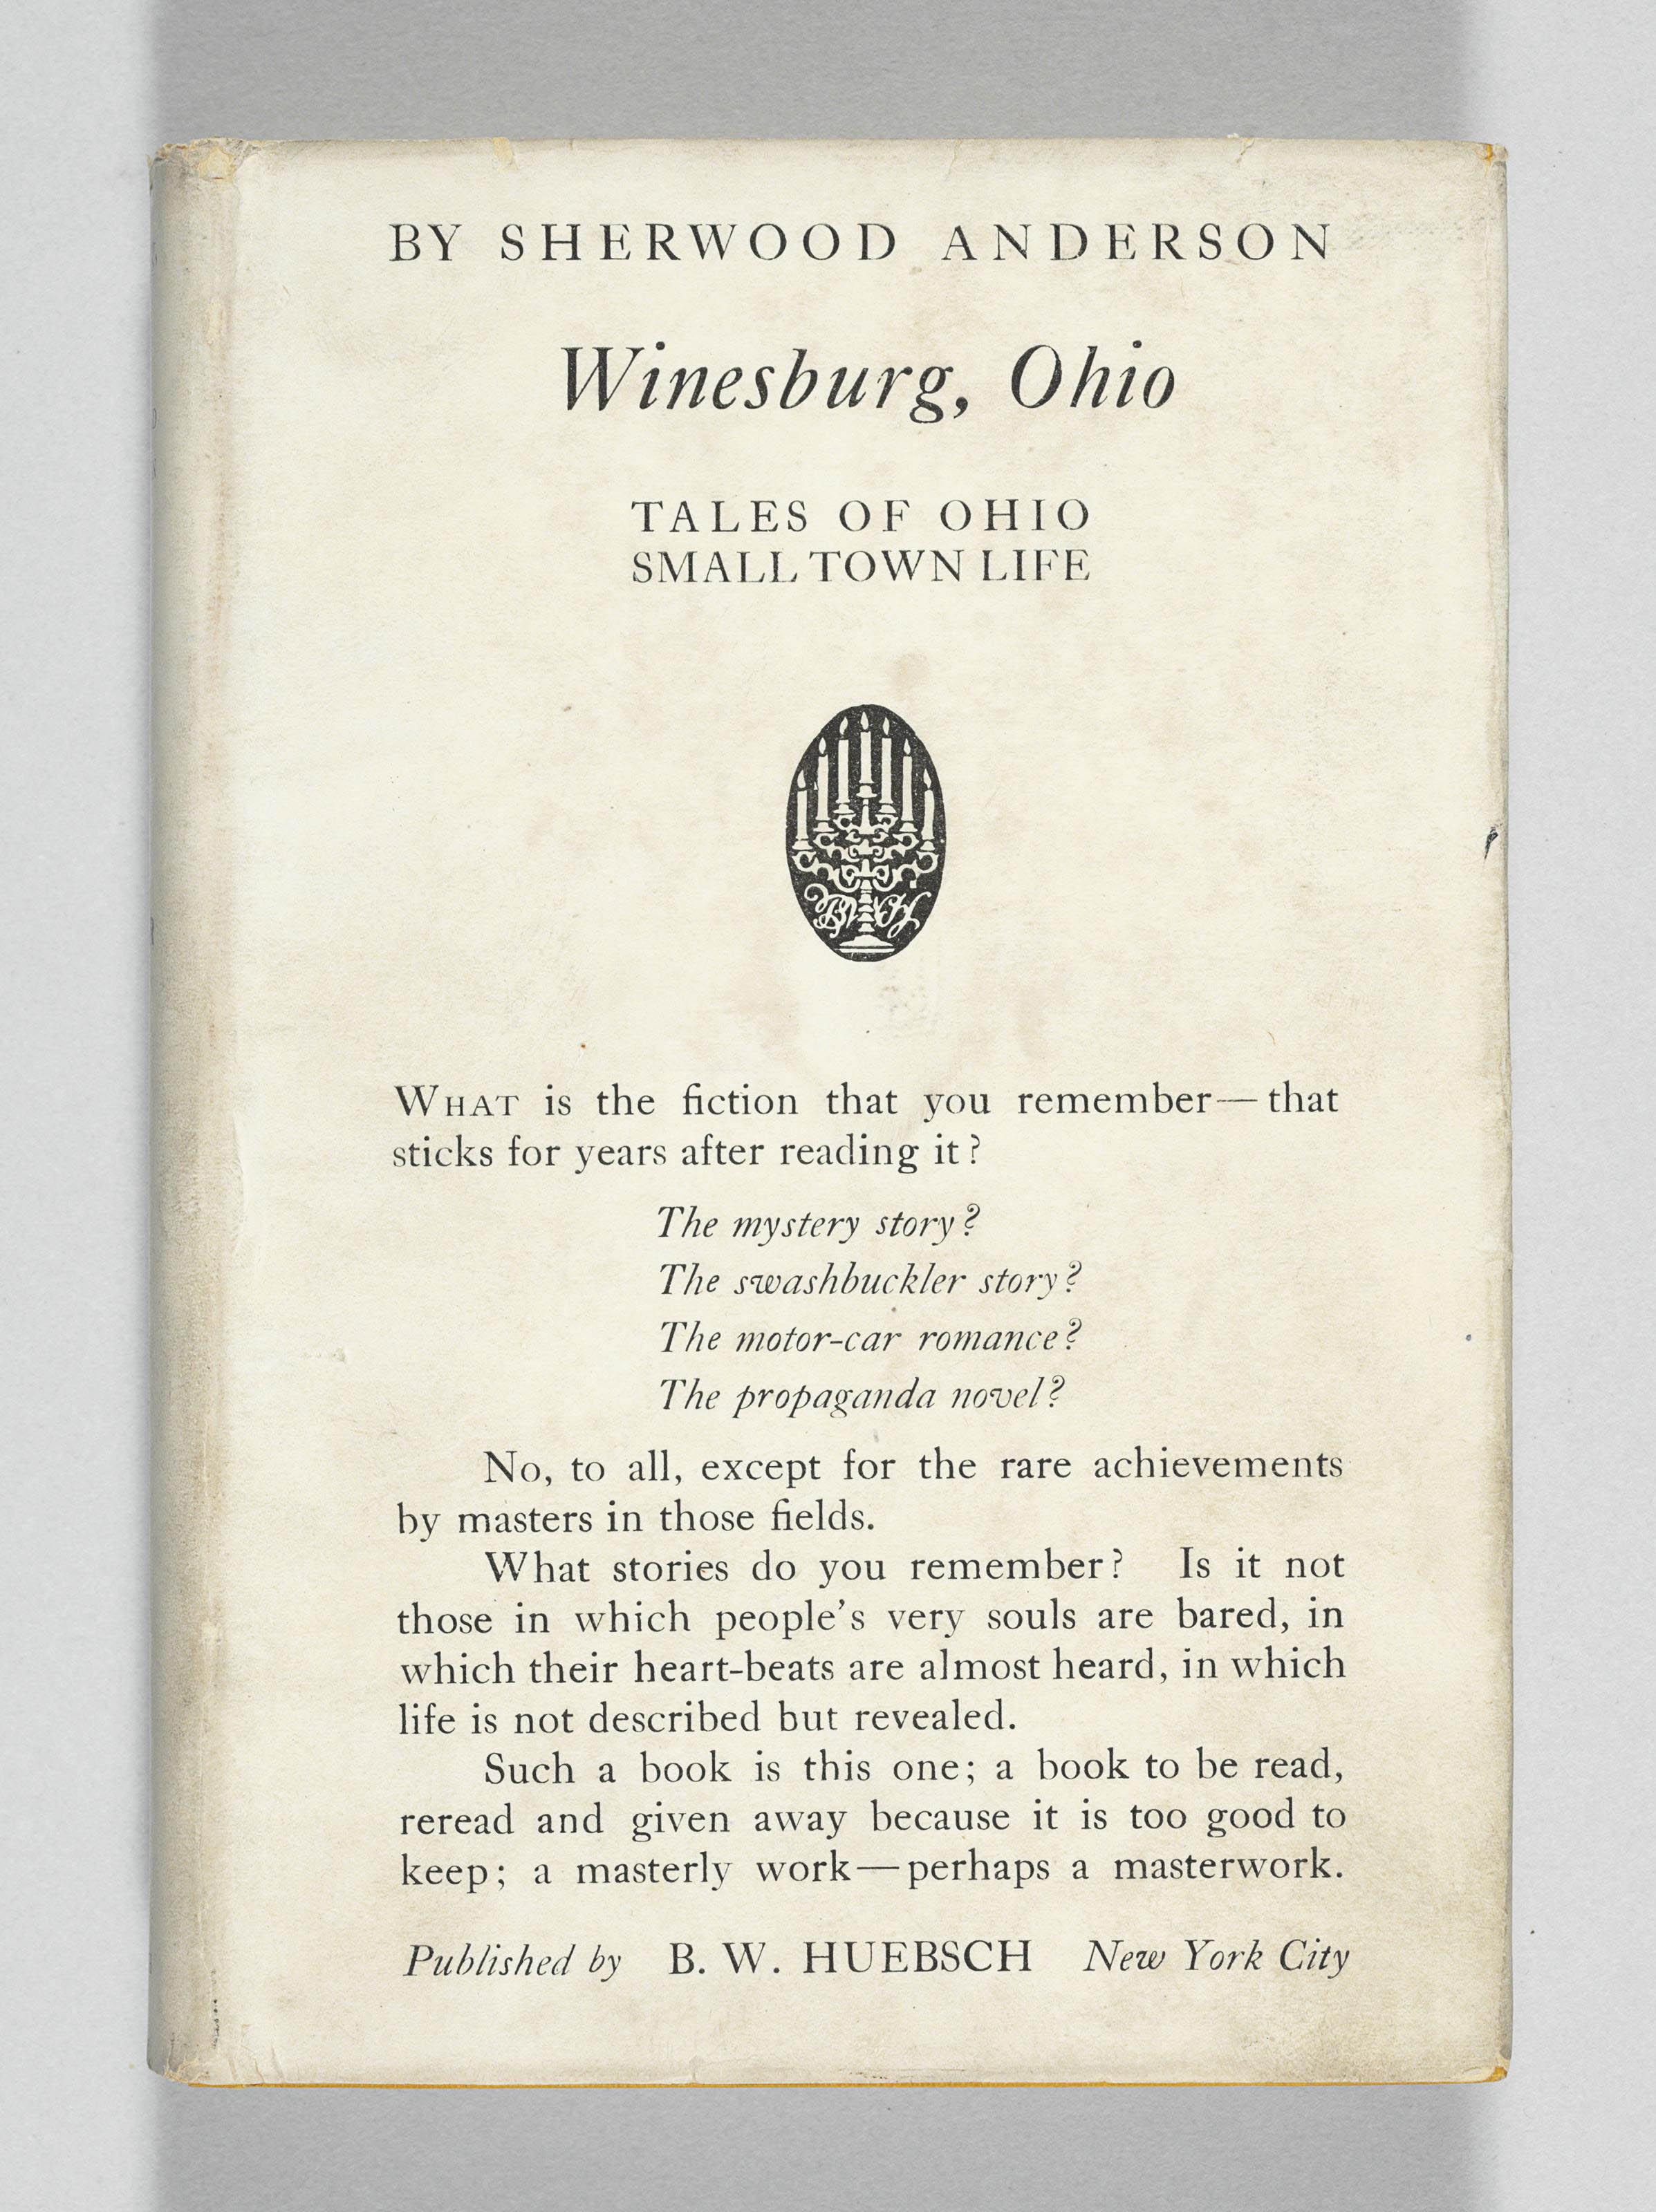 ANDERSON, Sherwood (1876-1941). Winesburg, Ohio. New York: B.W. Huebsch, 1919.